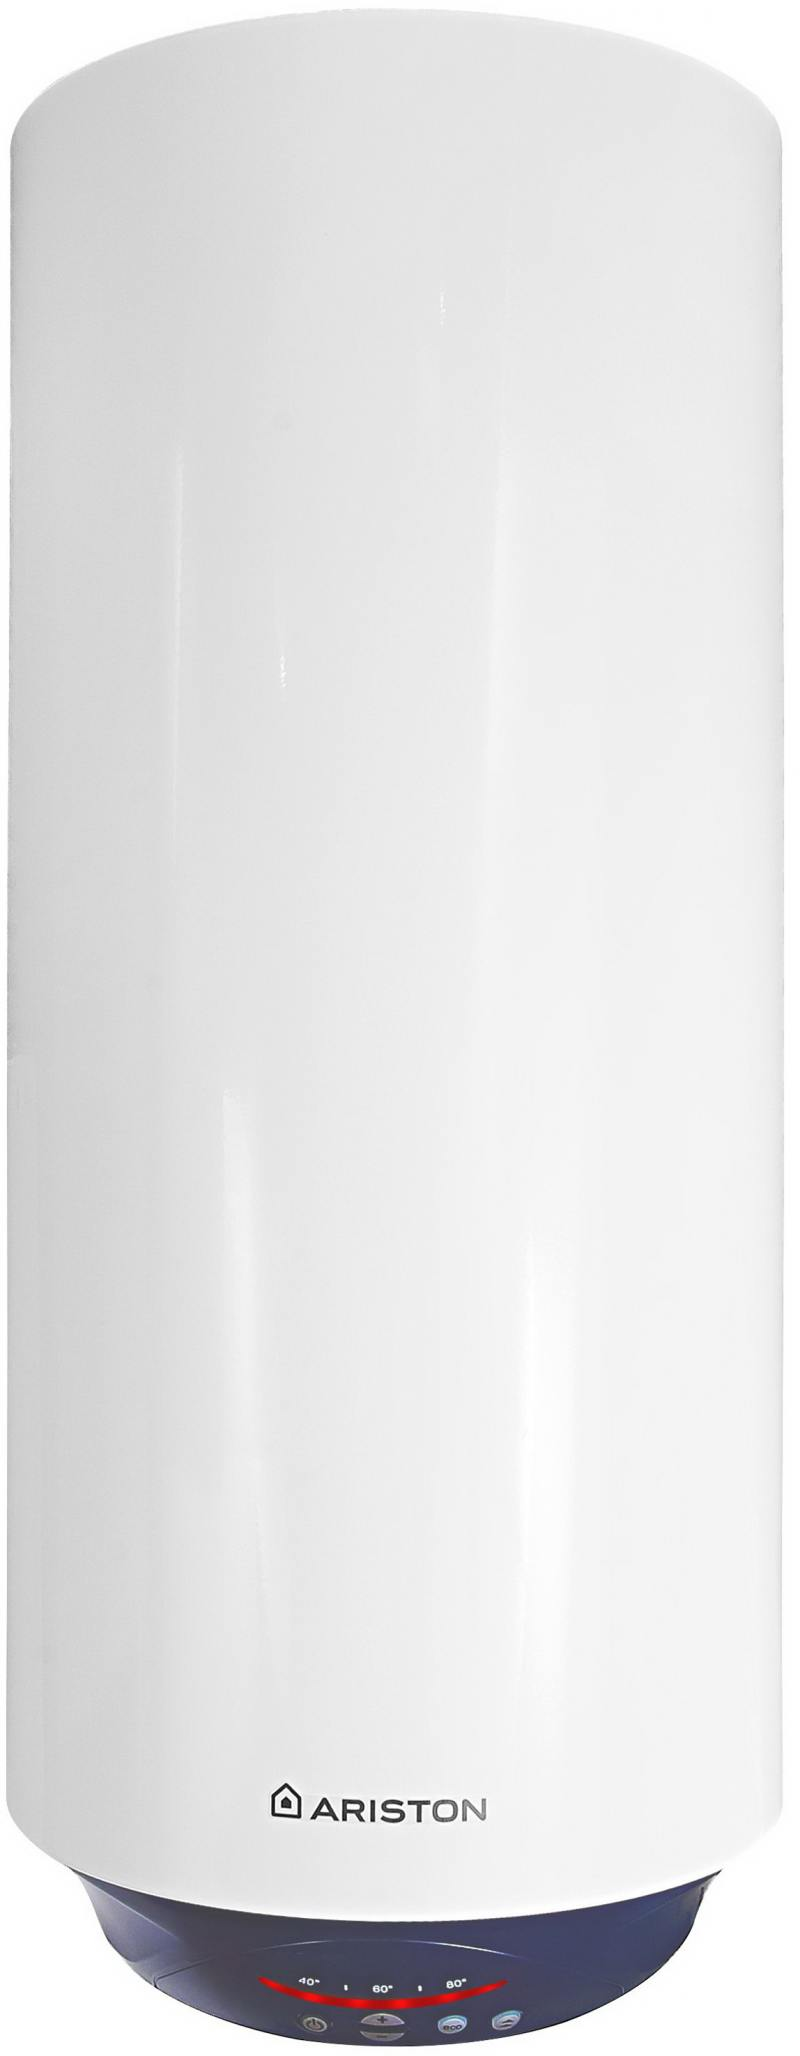 Водонагреватель накопительный Ariston ABS BLU ECO PW 50 V SLIM 50л 2.5кВт белый car styling for chevrolet trax led headlights for trax head lamp angel eye led front light bi xenon lens xenon hid kit